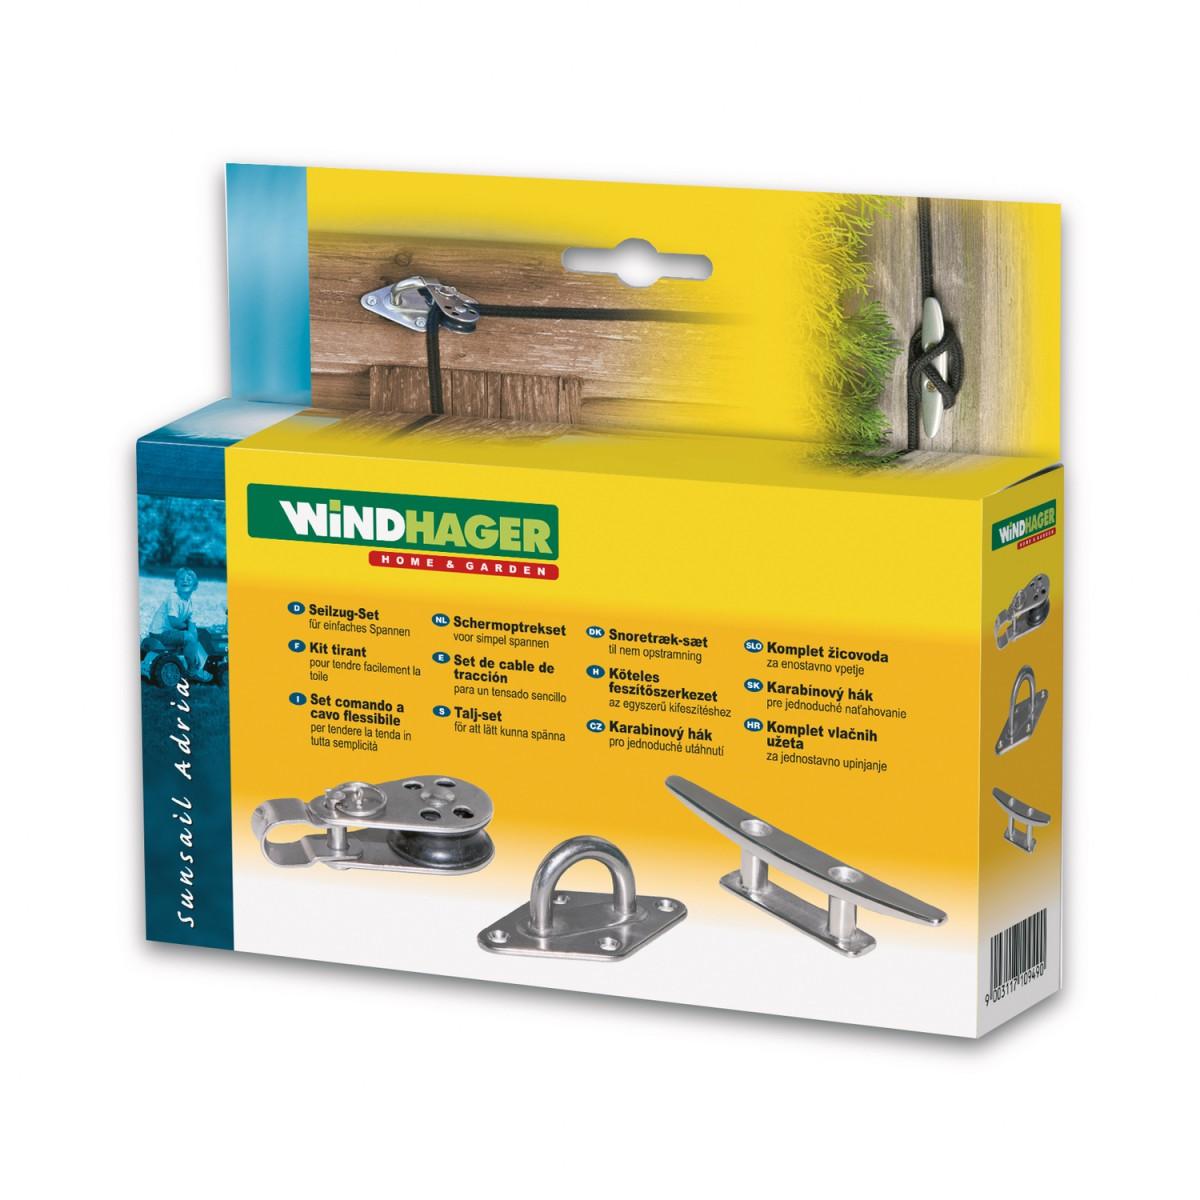 windhager sonnensegel seilspanntechnik markise. Black Bedroom Furniture Sets. Home Design Ideas